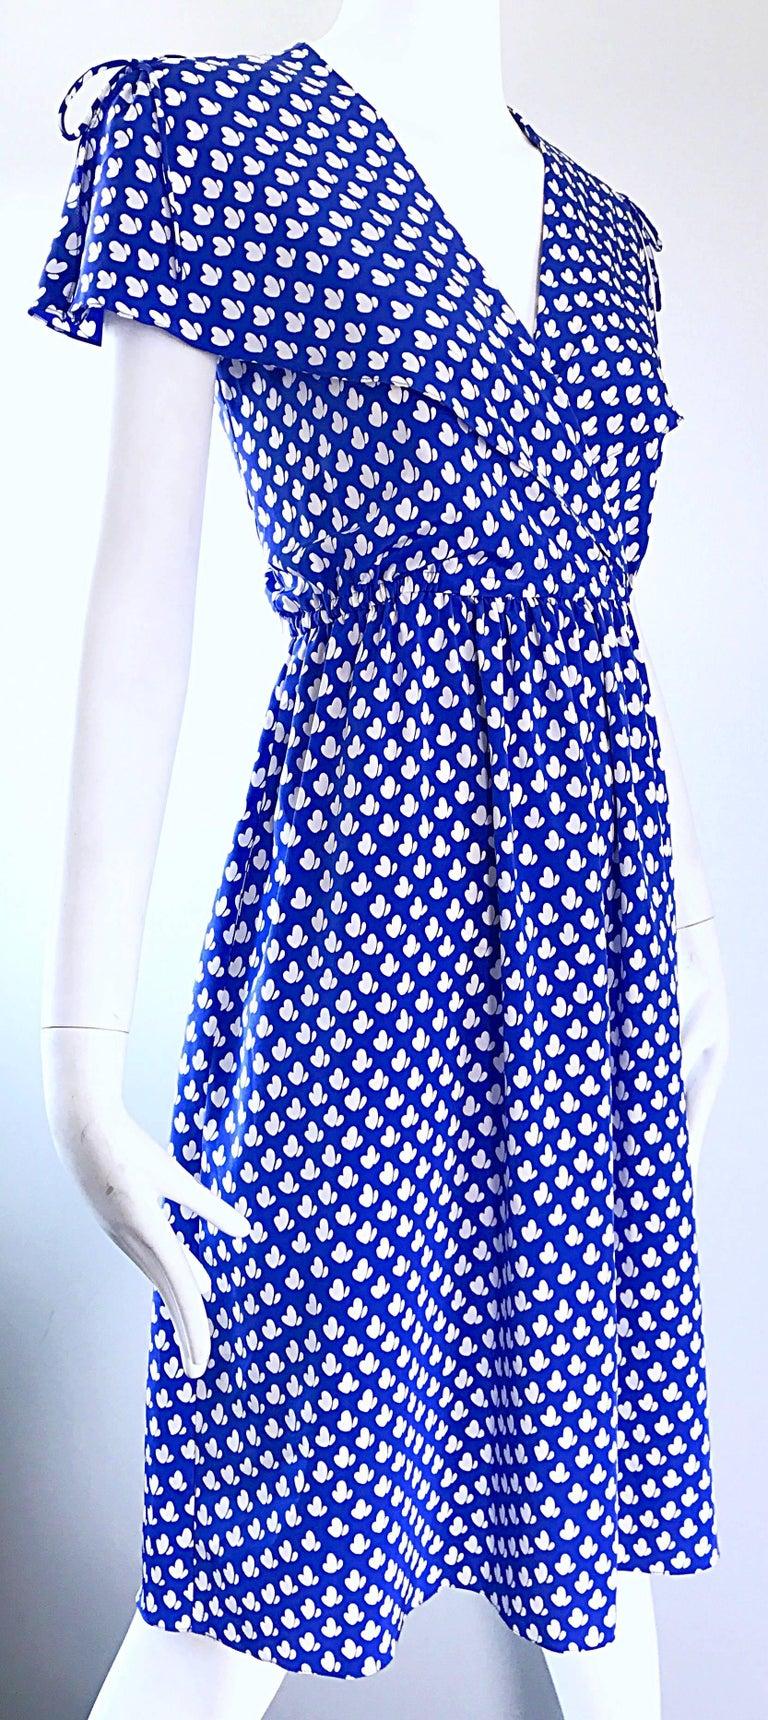 Women's Vintage Pierre Cardin 1970s Blue + White Heart Print Flutter Sleeve 70s Dress For Sale